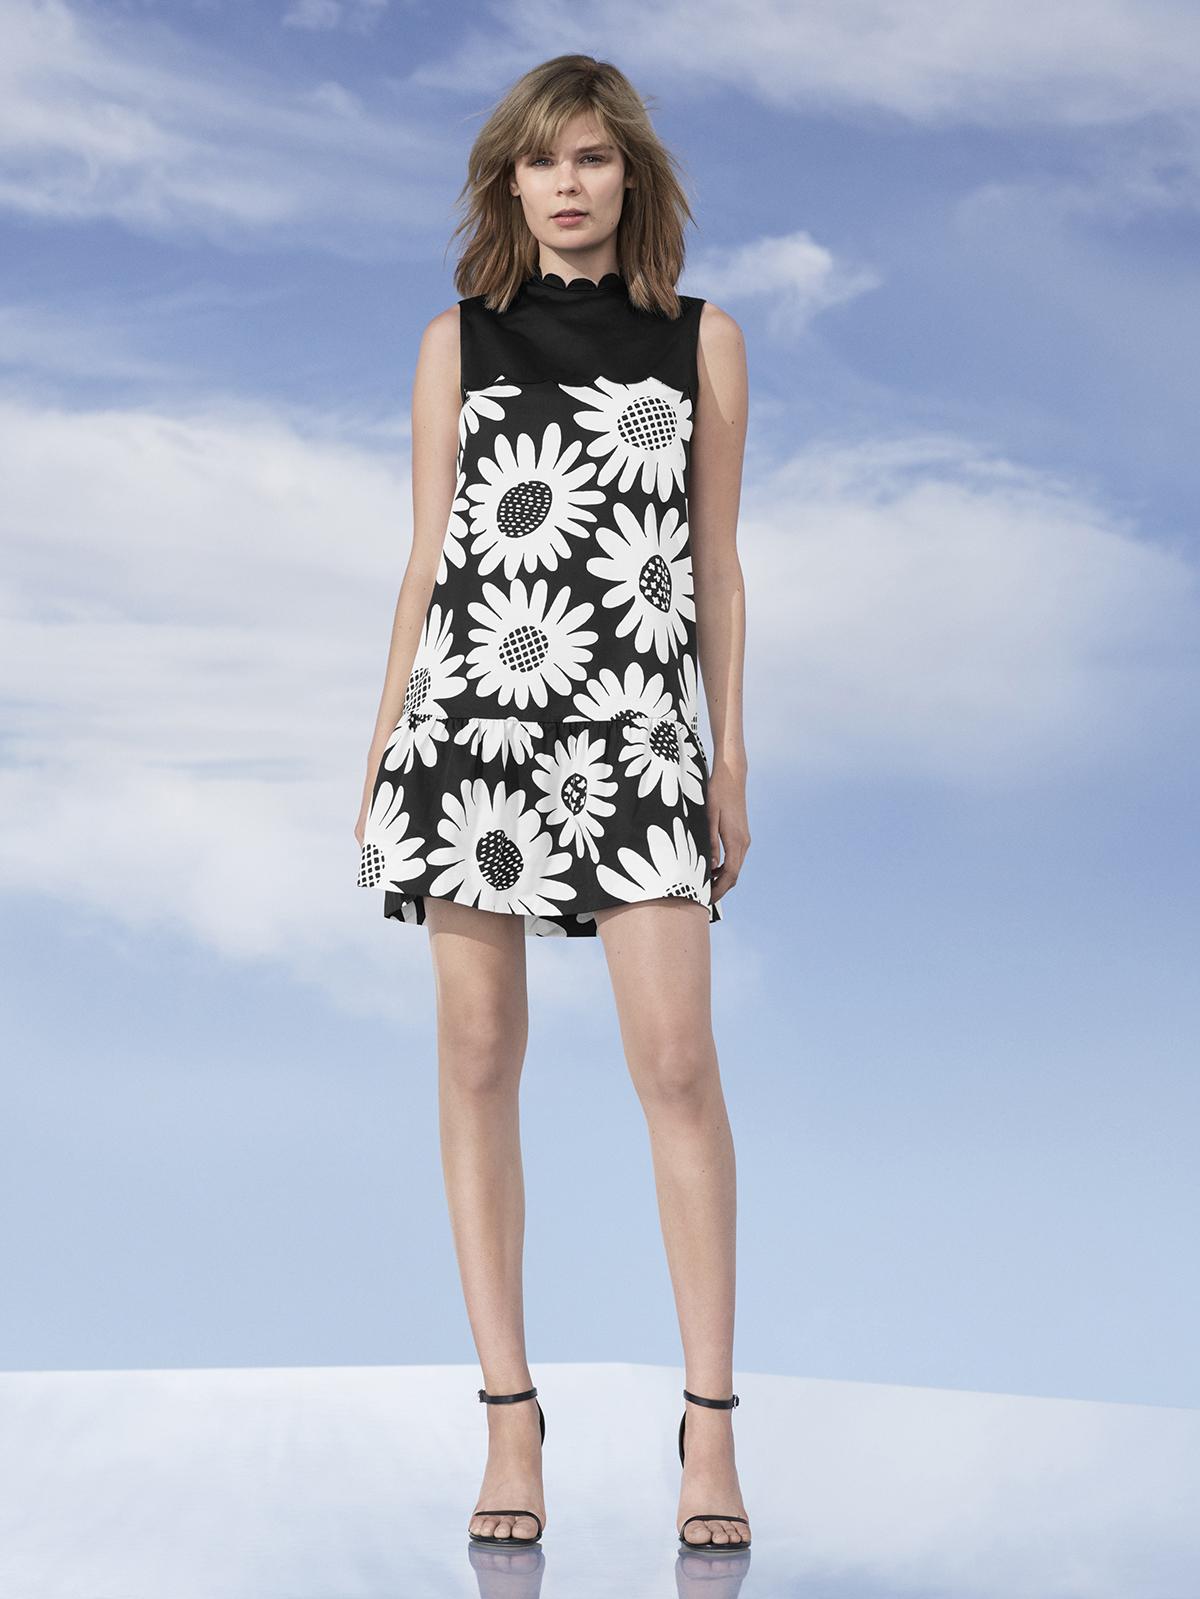 Black Daisy Drop Waist Scallop-Trim Dress, $40